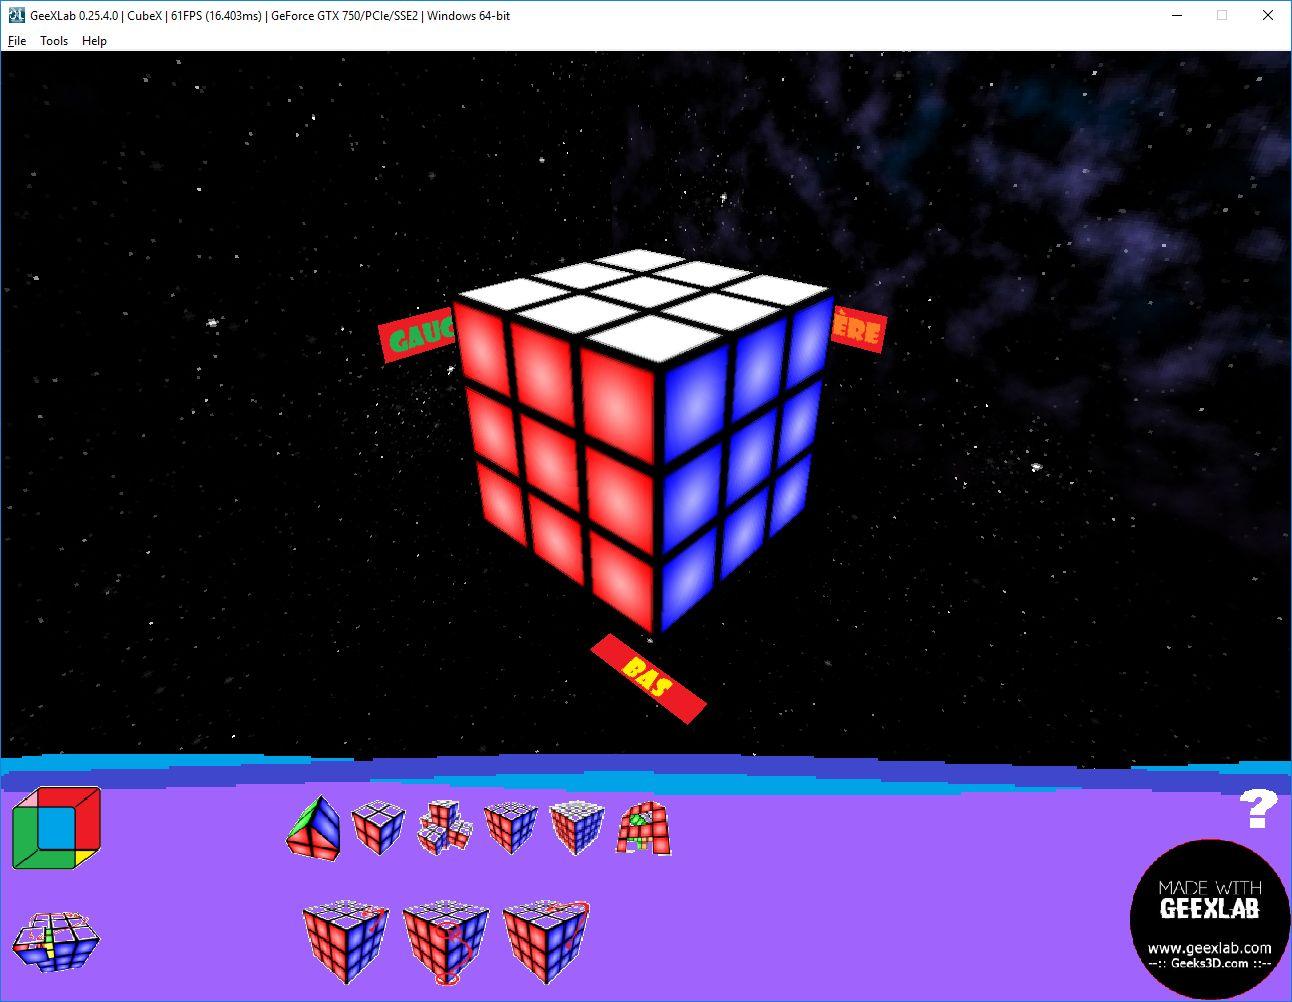 Cubex multiformes 3x3